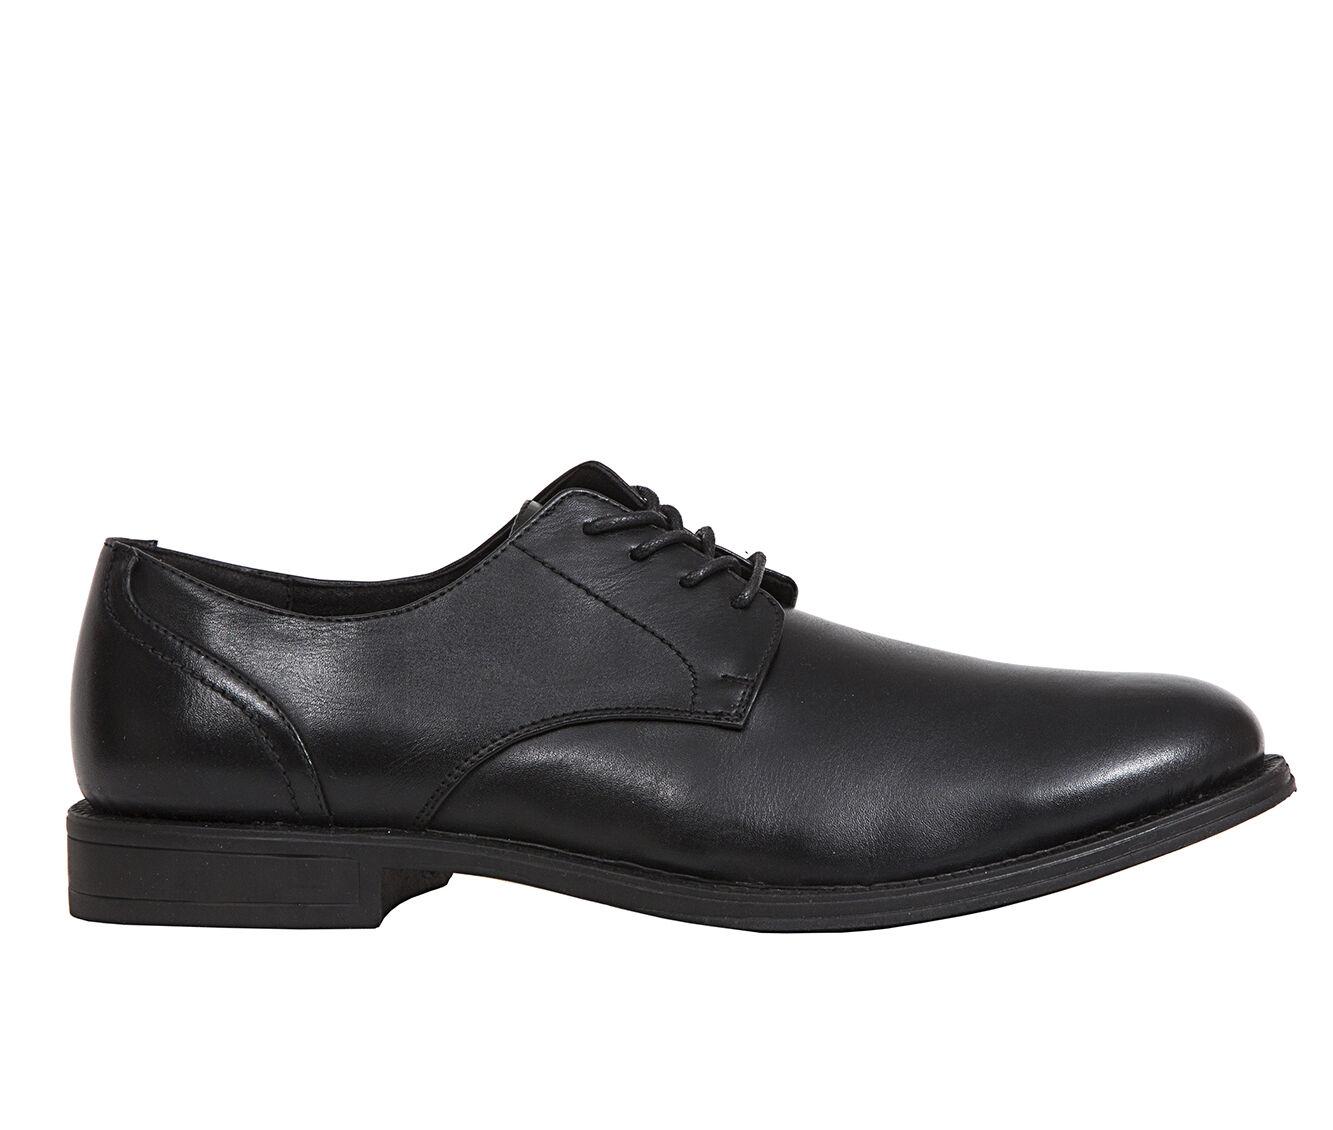 Men's Deer Stags Steward Dress Shoes Black